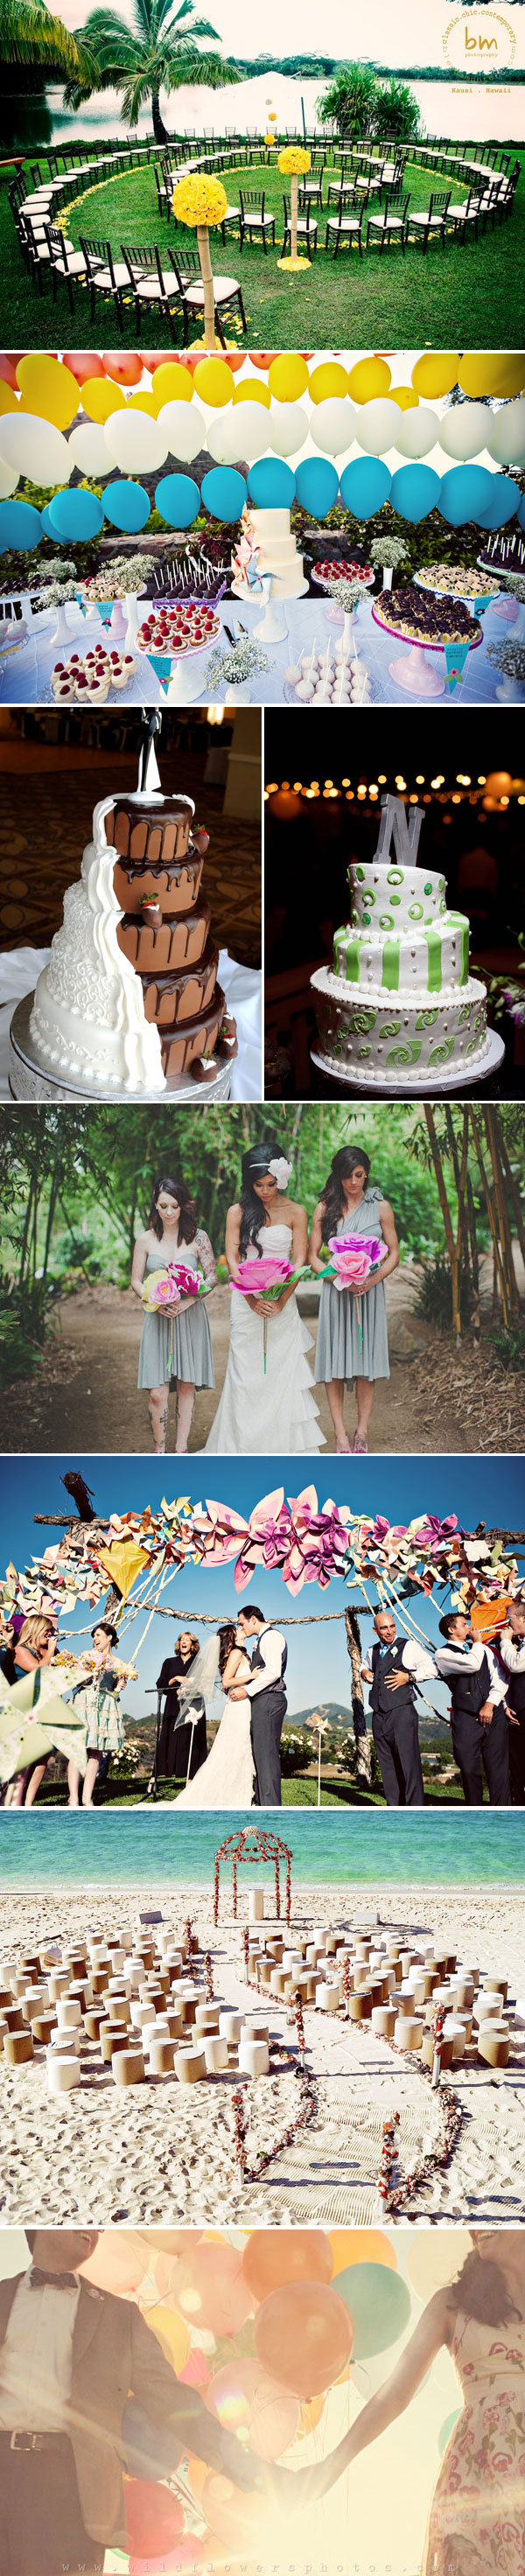 whimsical wedding style